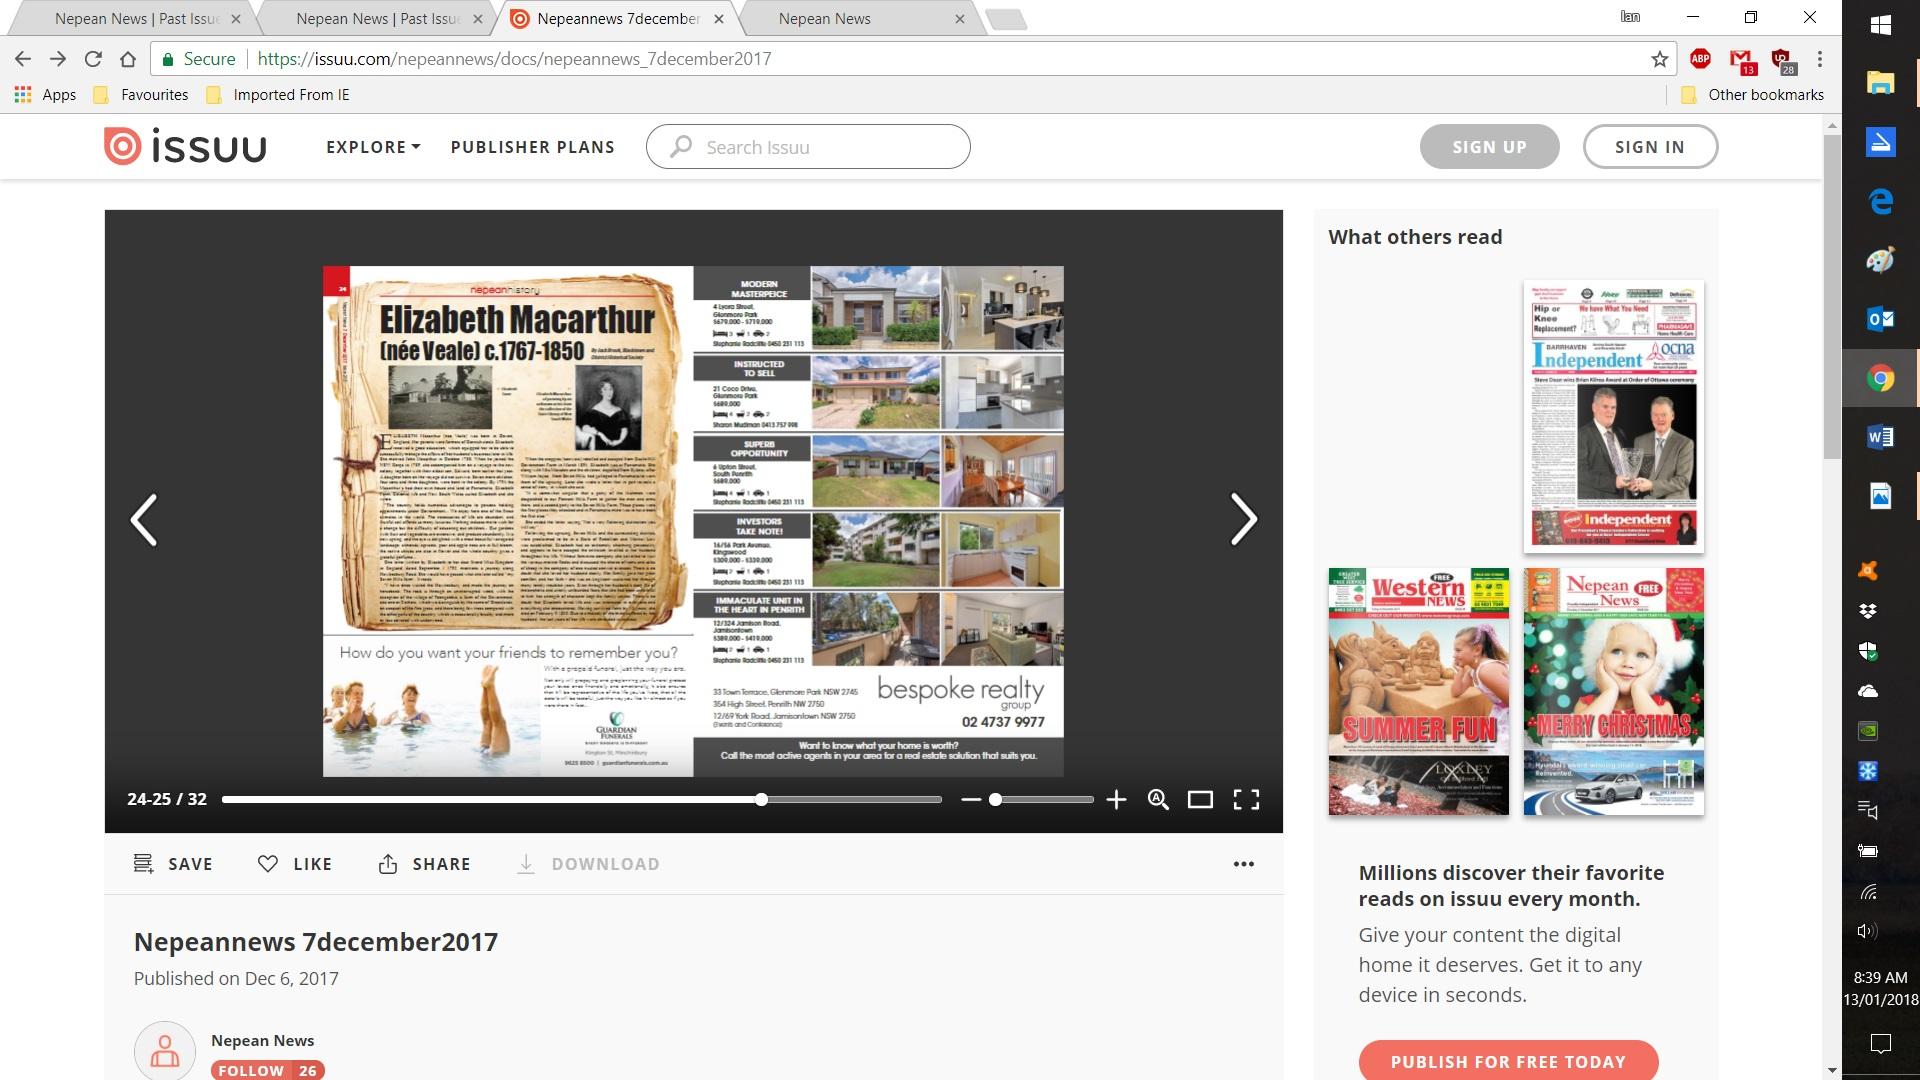 Nepean News Screenshot [2] 2018-01-13 08.39.47